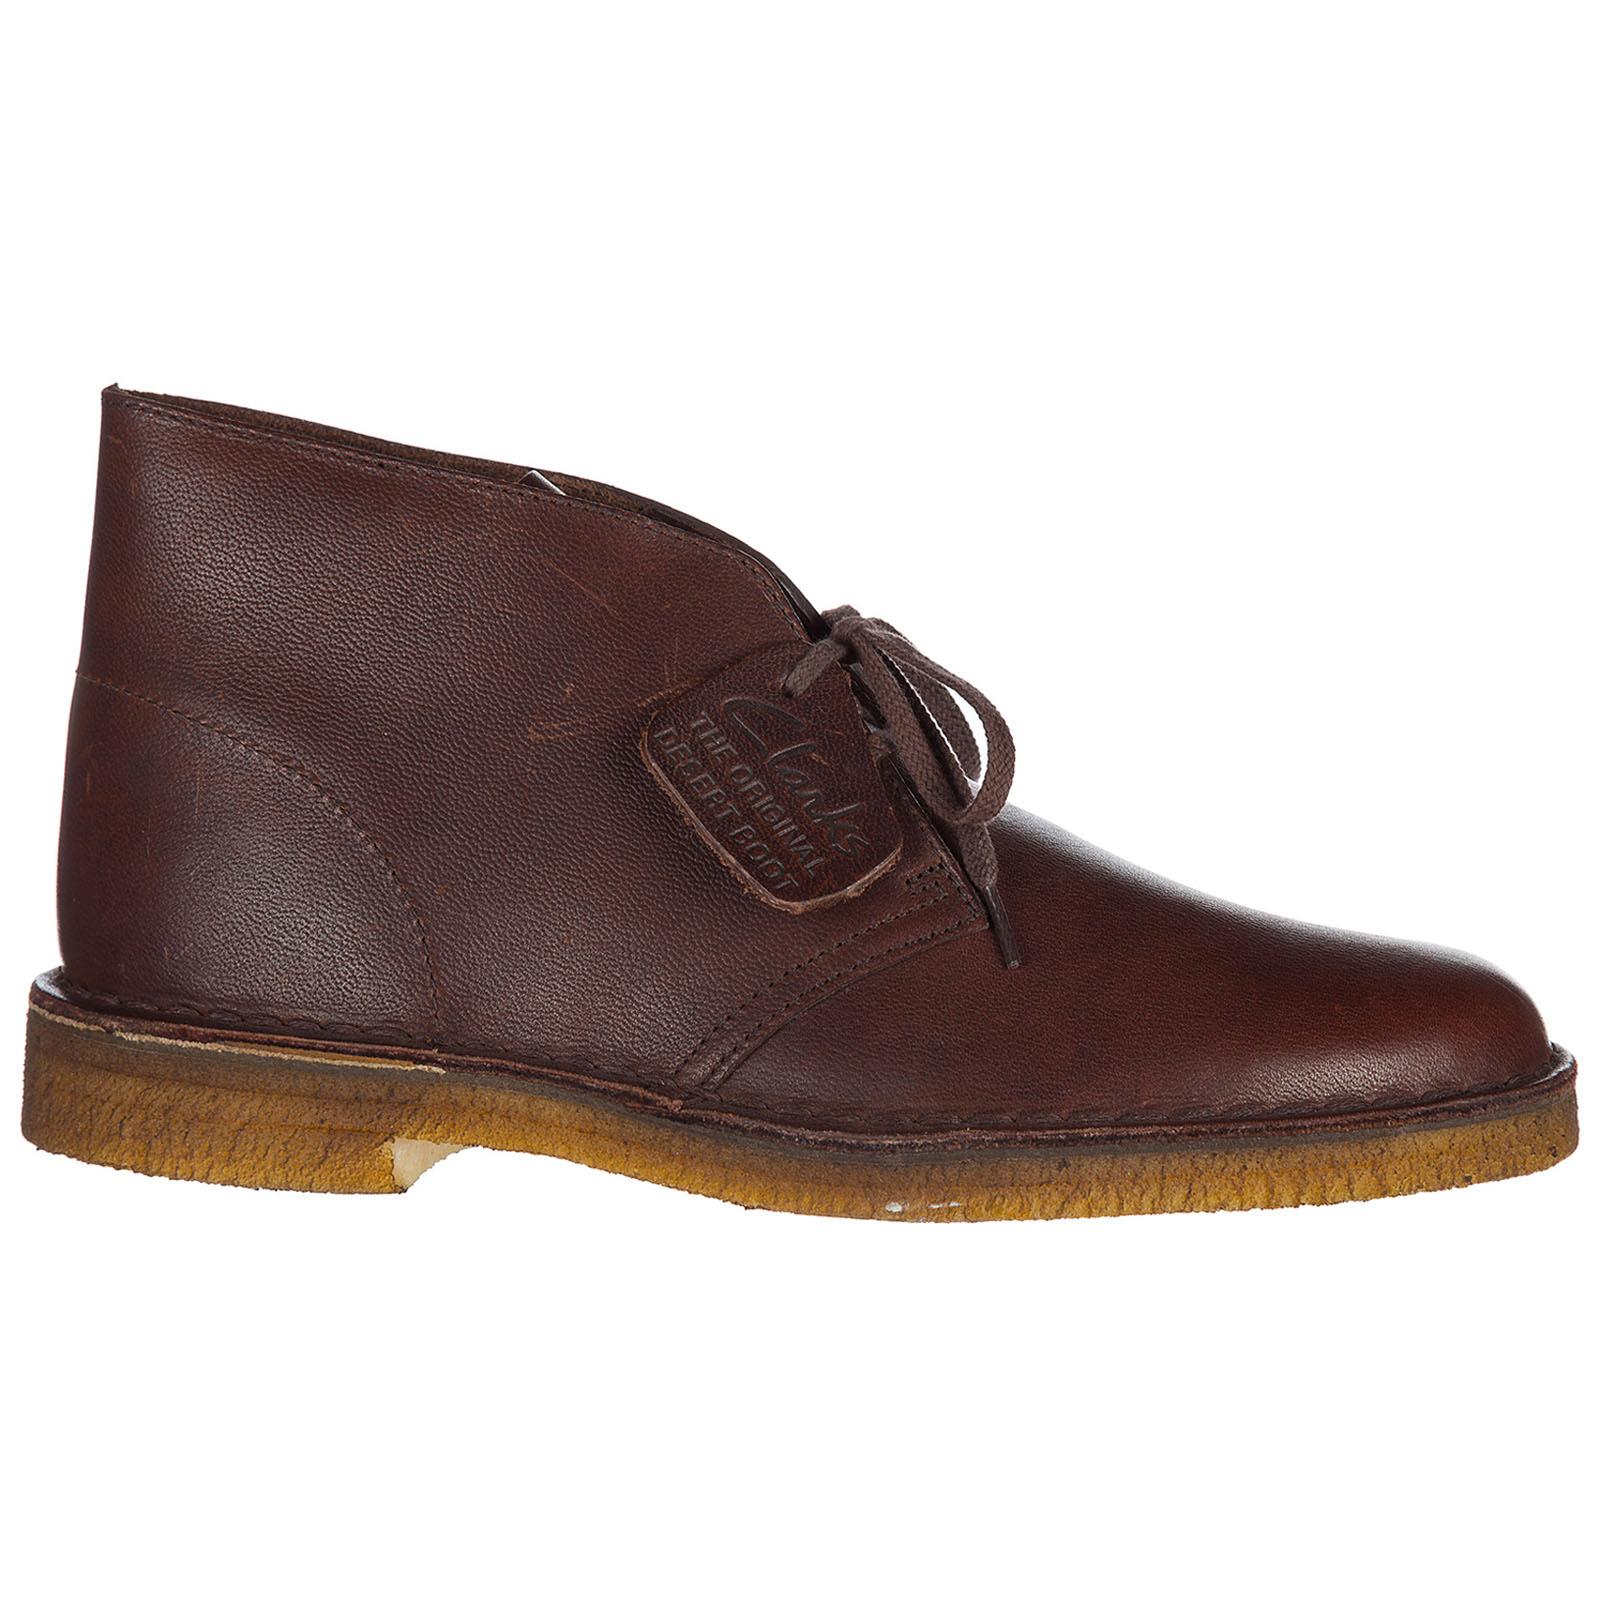 b708ec3f875cb Polacchine stivaletti scarpe uomo pelle Polacchine stivaletti scarpe uomo  pelle ...